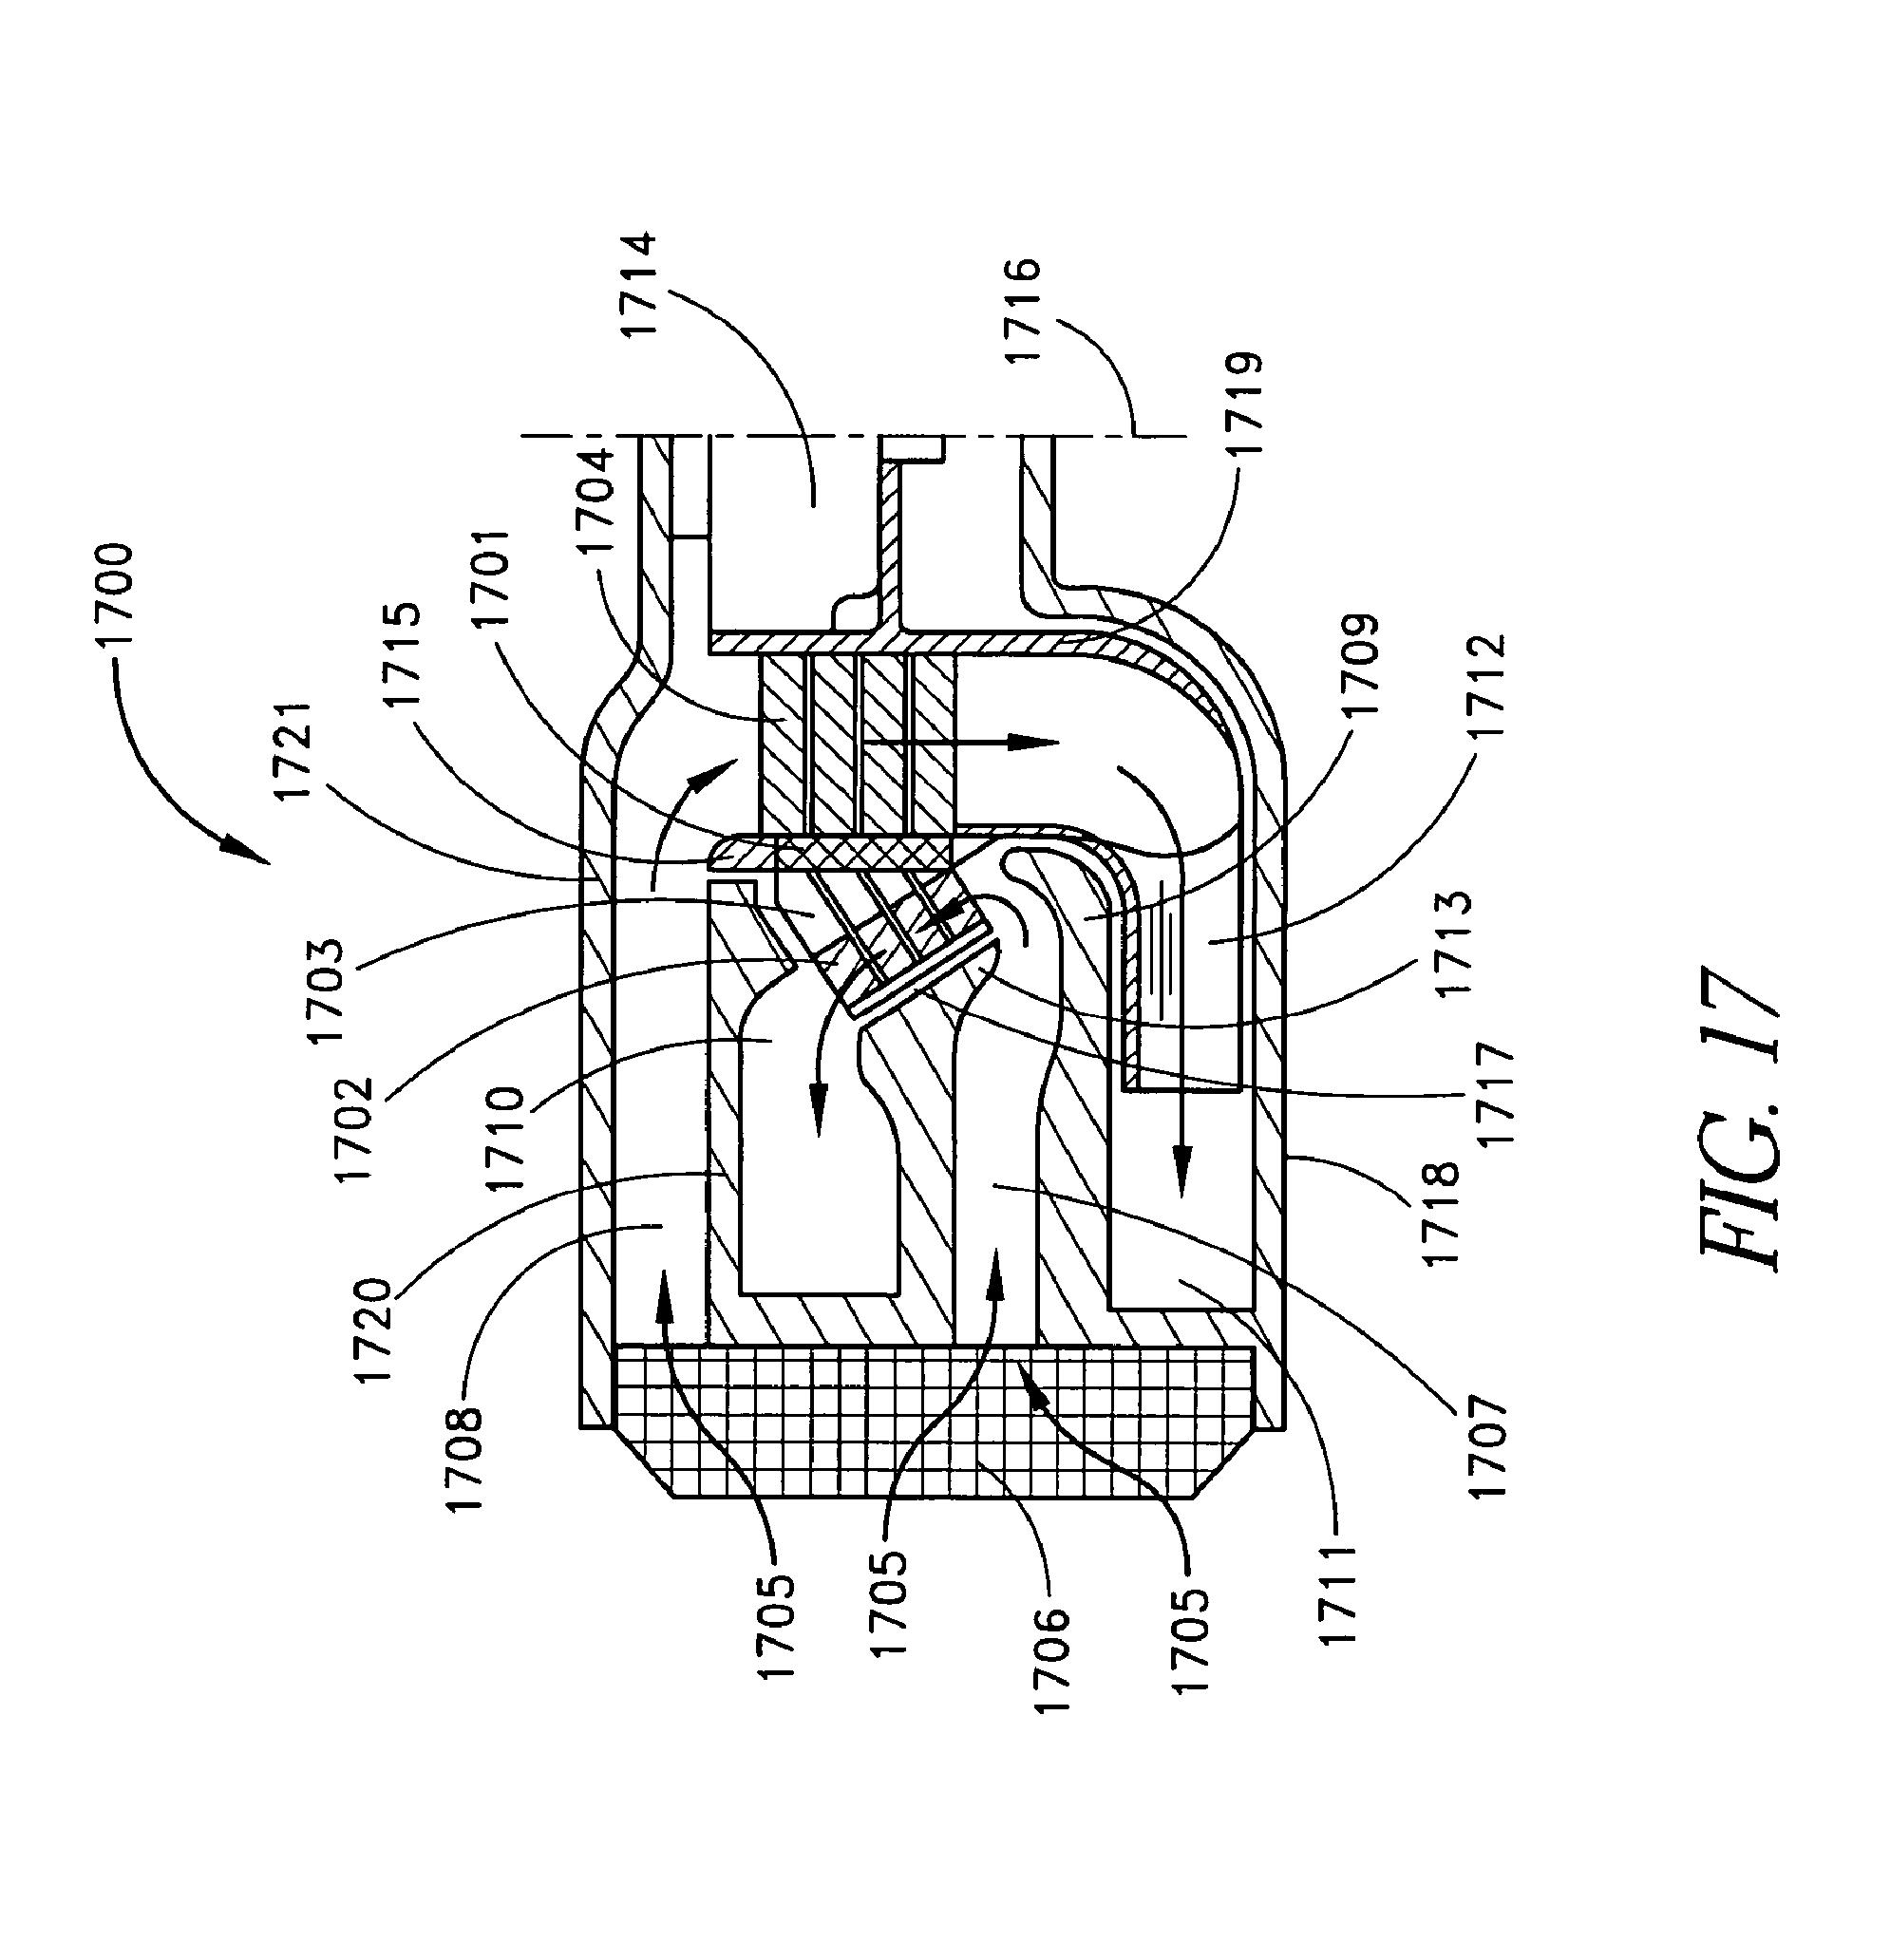 patent usre44272 thermoelectric heat exchanger google. Black Bedroom Furniture Sets. Home Design Ideas